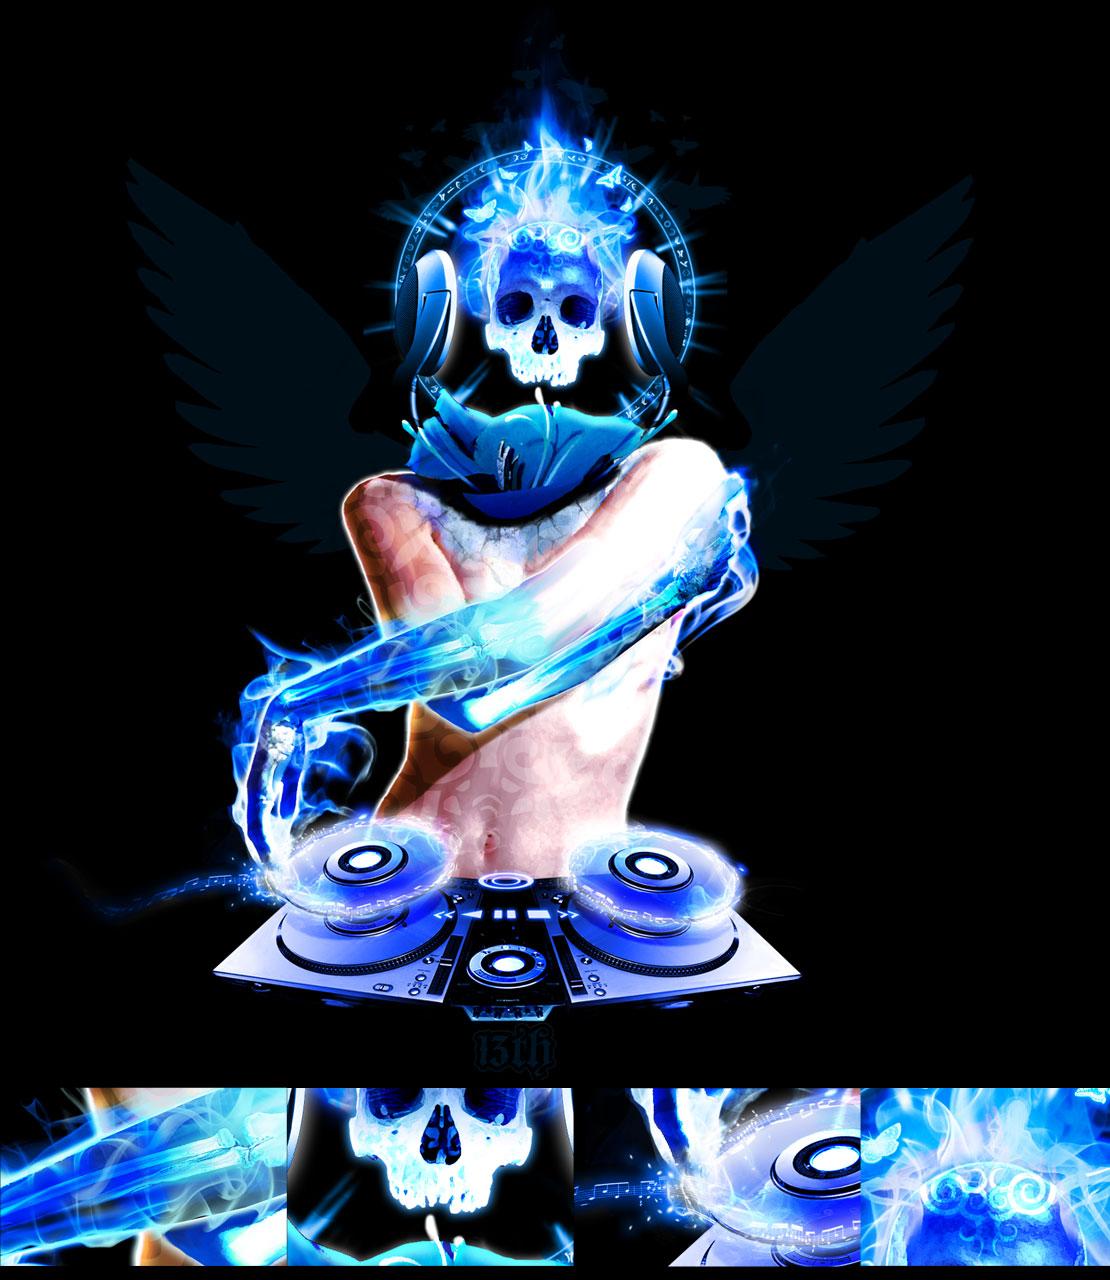 Blue Flaming Skull Wallpaper Flames 1110x1280